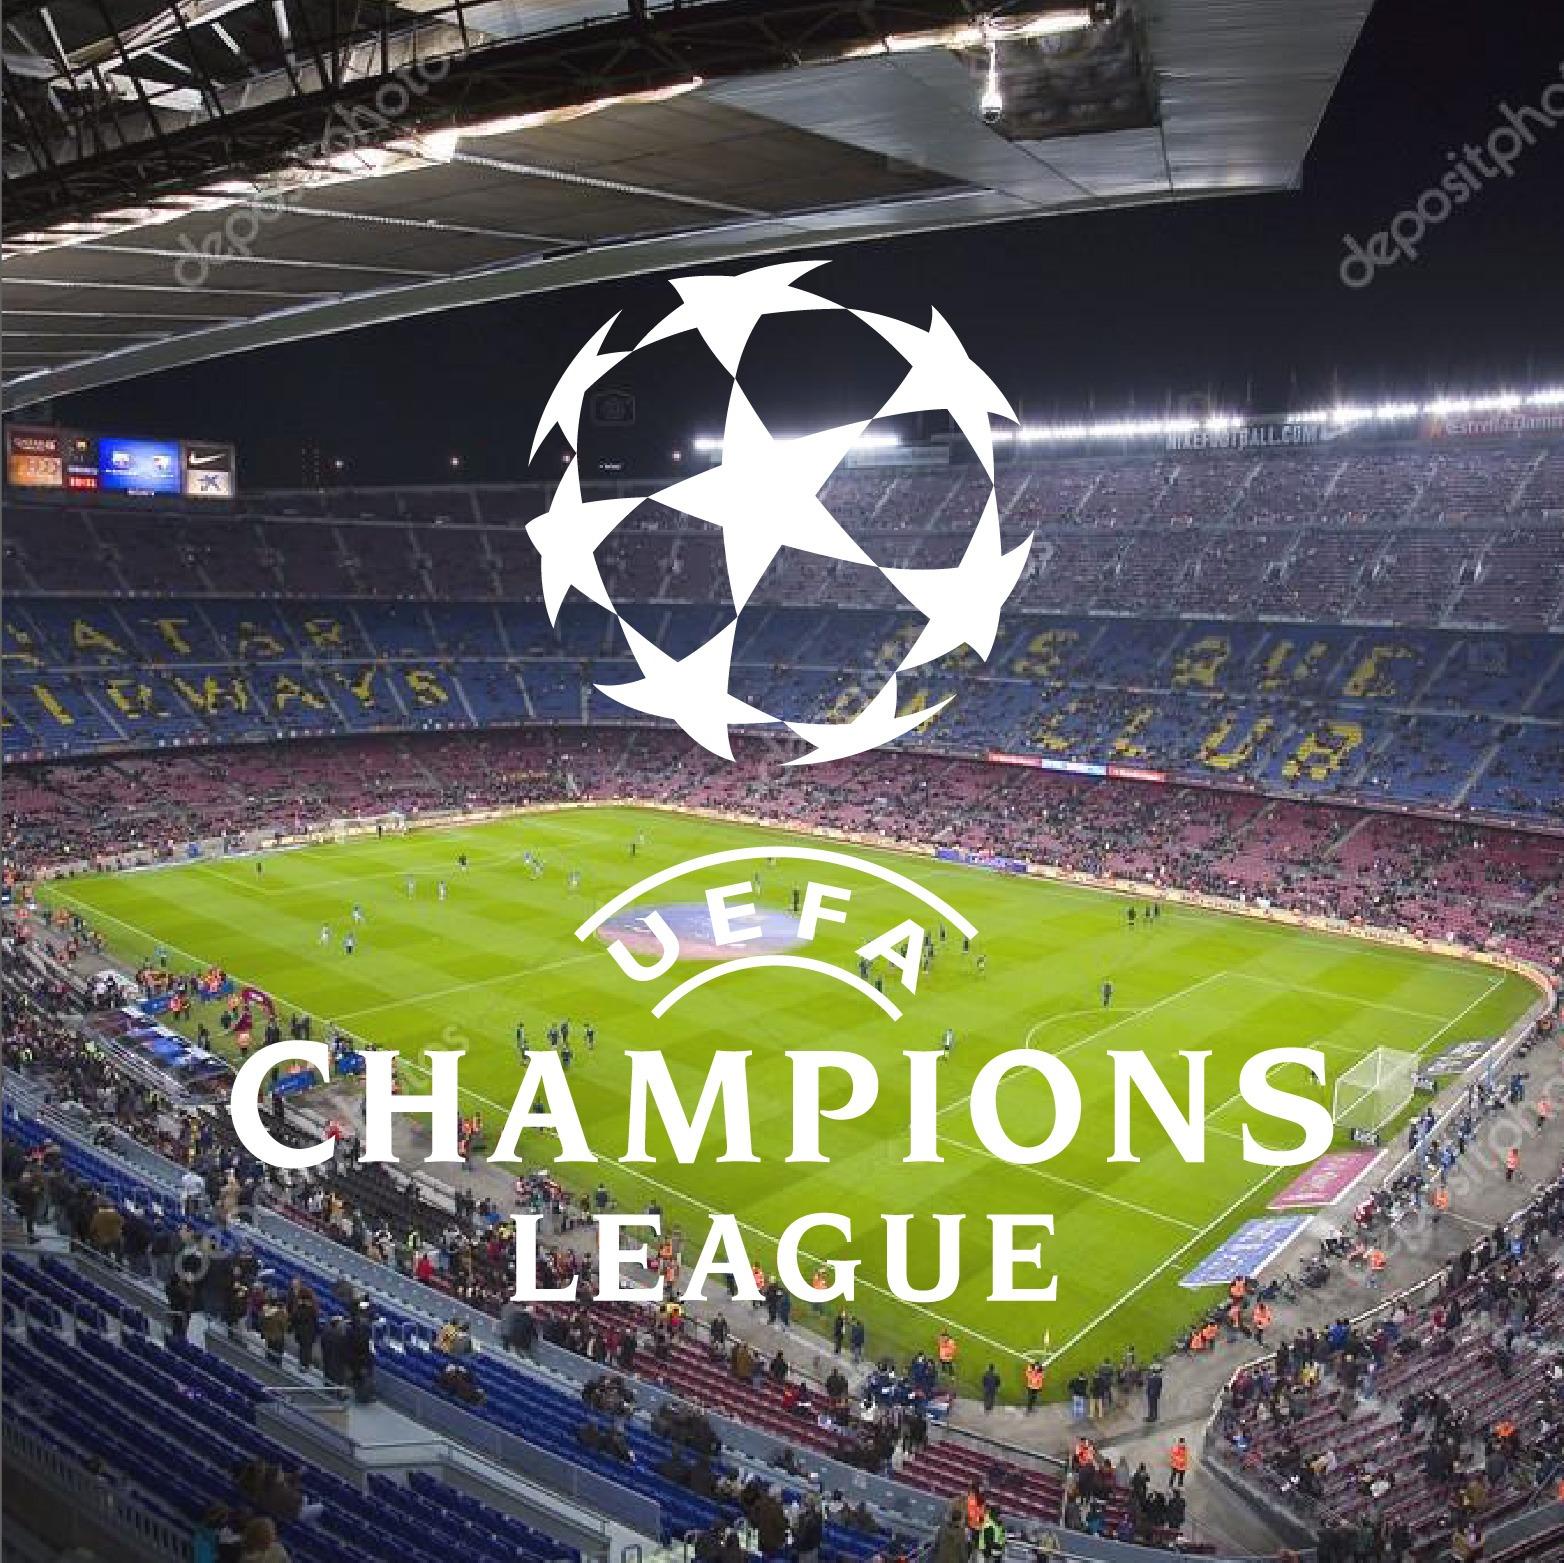 Championsleague Thumb 1 01